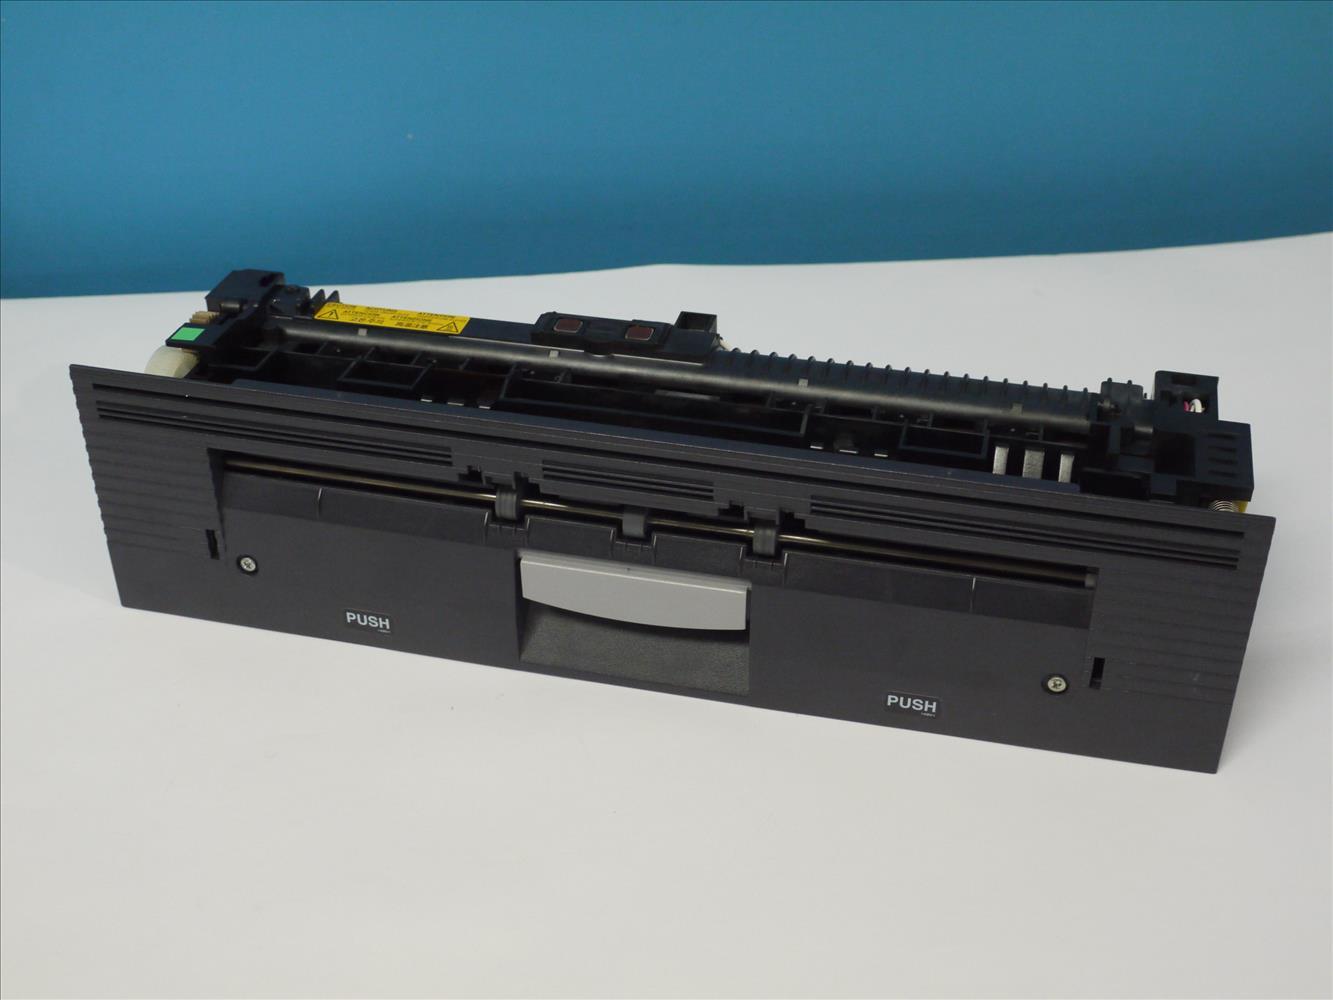 LS-6950DN 京セラ 定着ユニット 【中古】